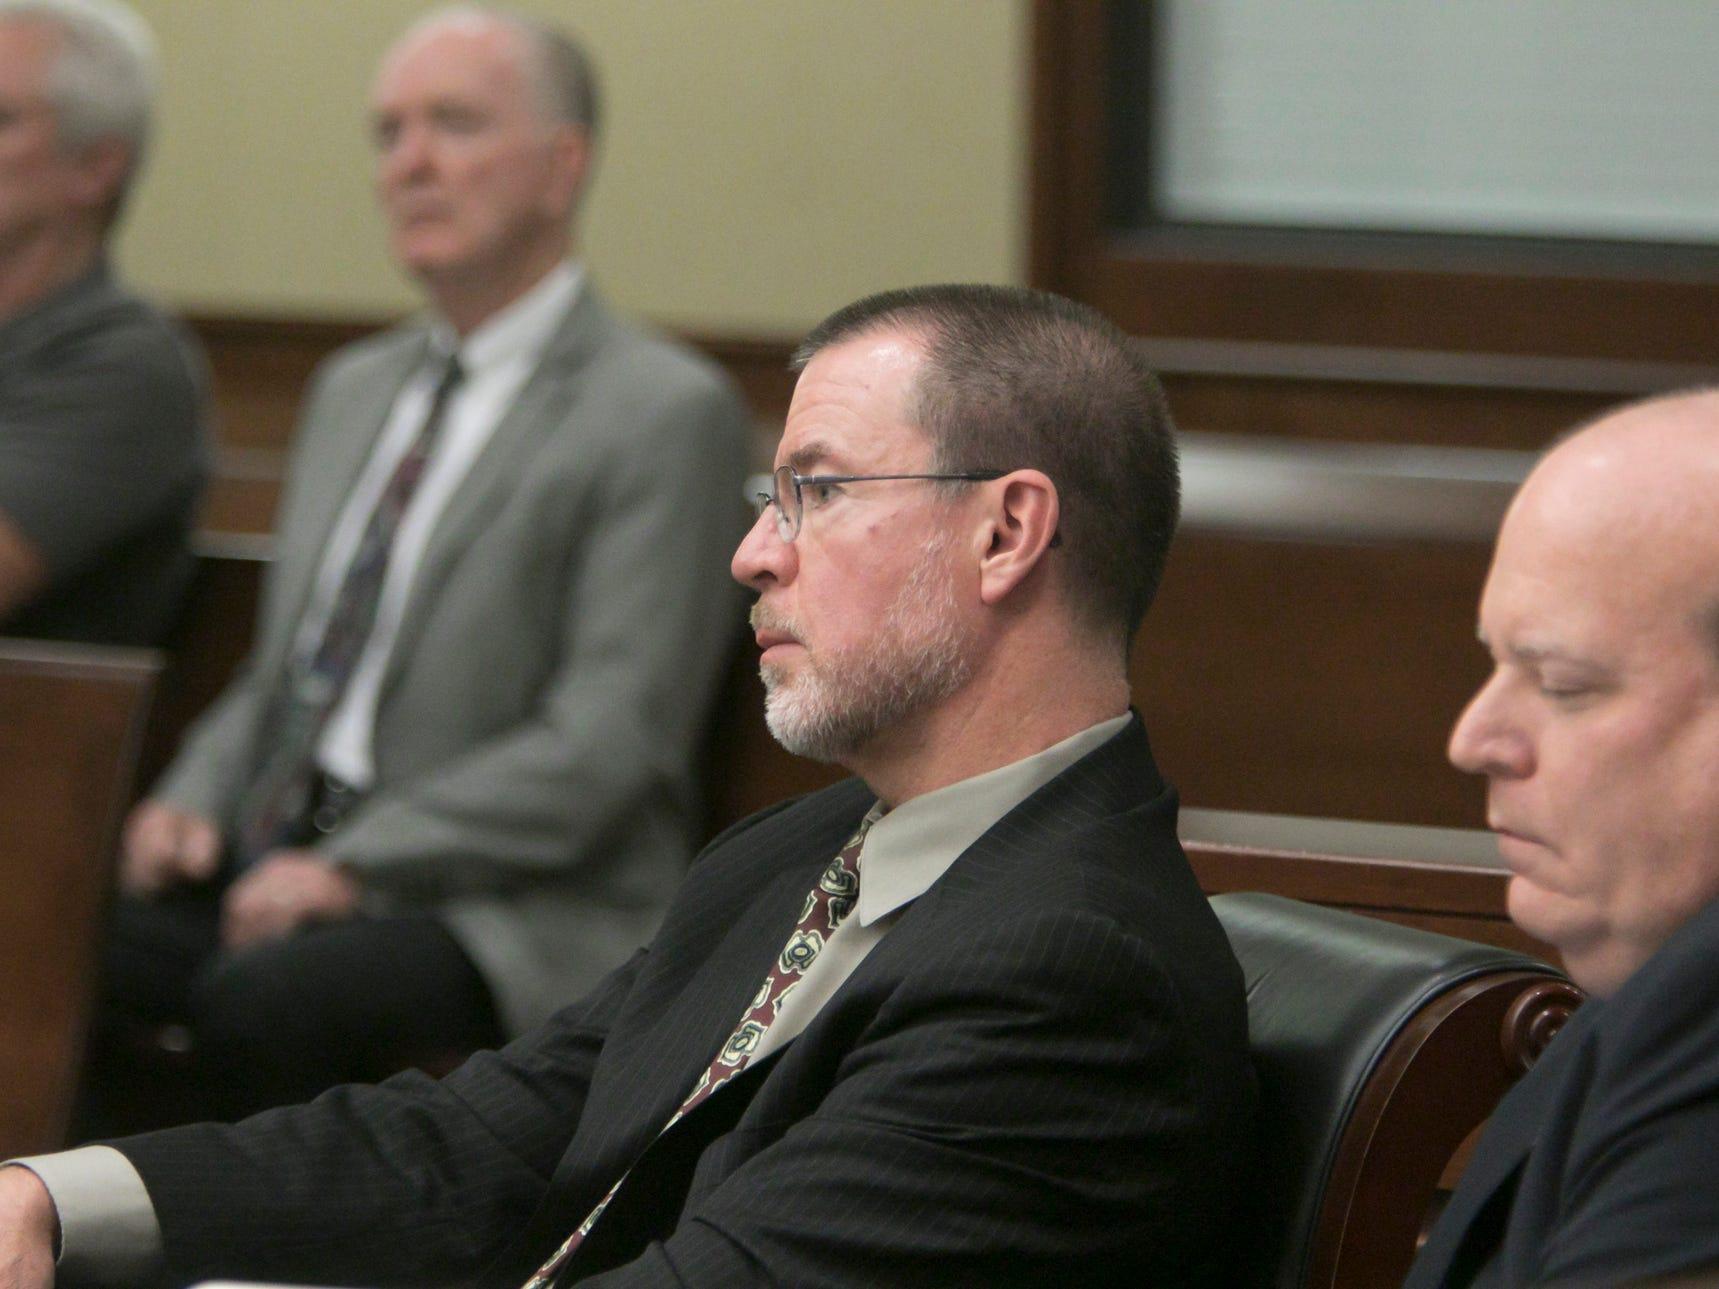 JTC executive director Lynn Helland and associate examiner Casimir Swastek listen to testimony from attorney Amy Krieg Thursday, Oct. 4, 2018.